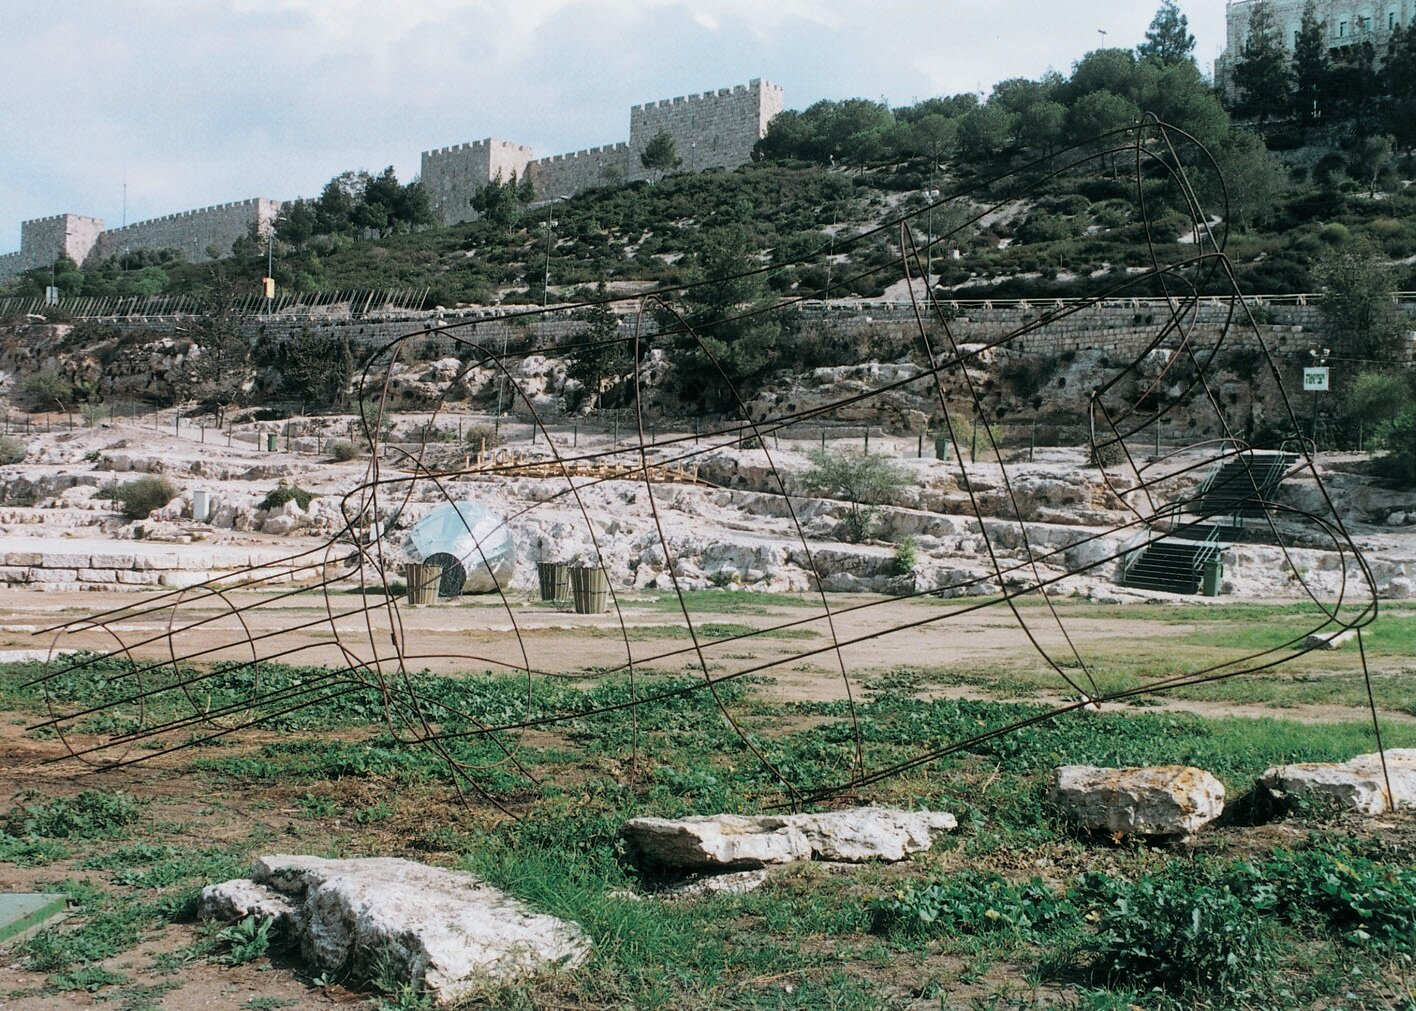 View-of-installation-Merrill-Hassenfeld-Amphitheater-Jerusalem-1999-Photo-by-International-Bie.jpg